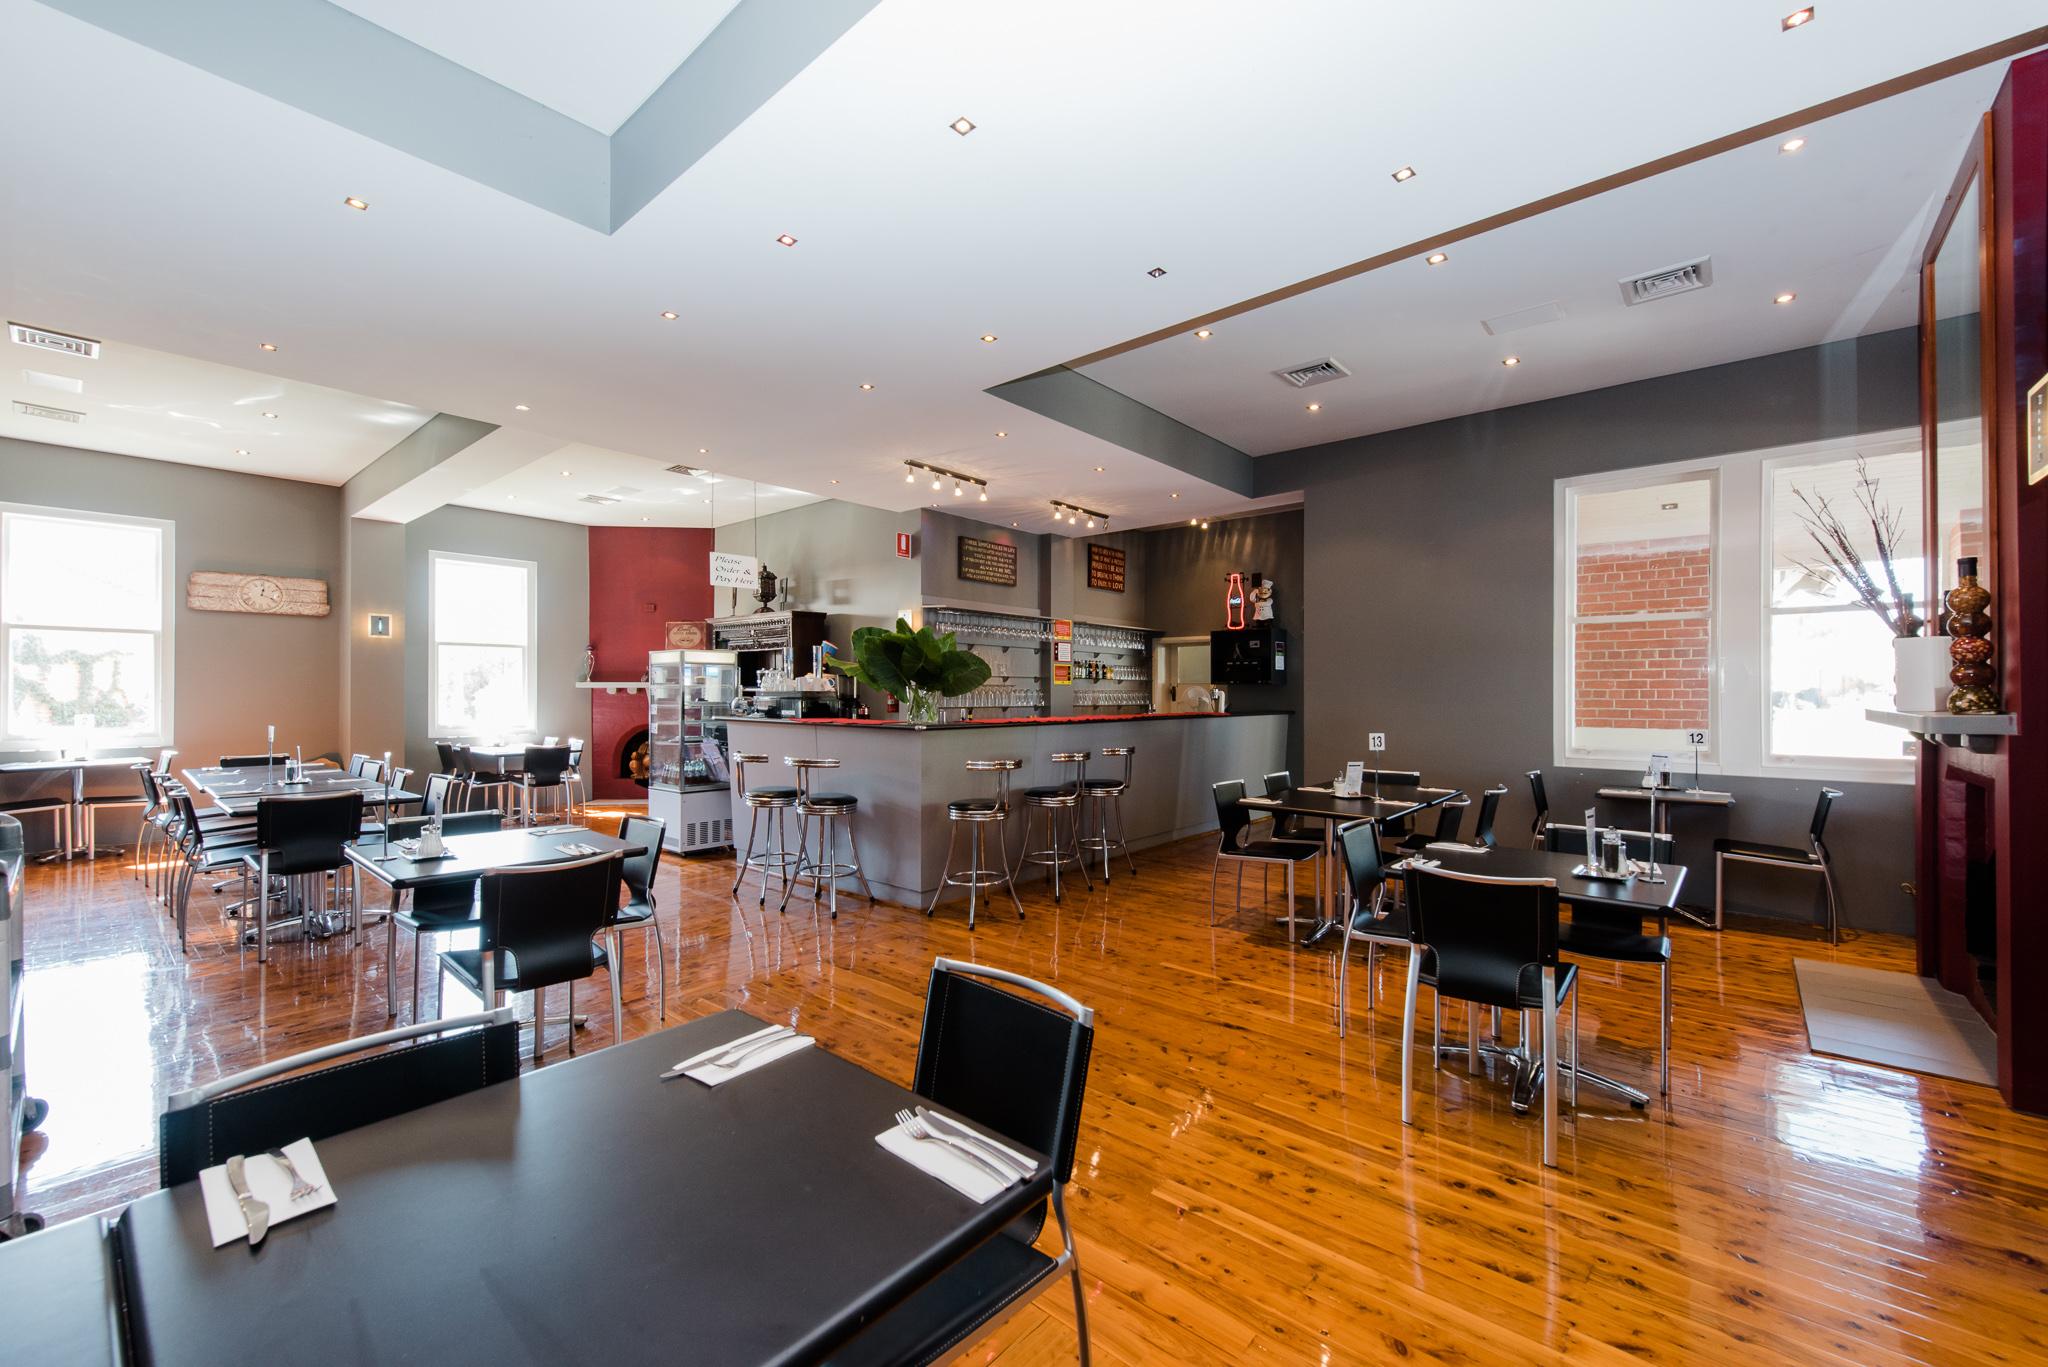 3 inside dining TOB - Georgie James-4.jpg